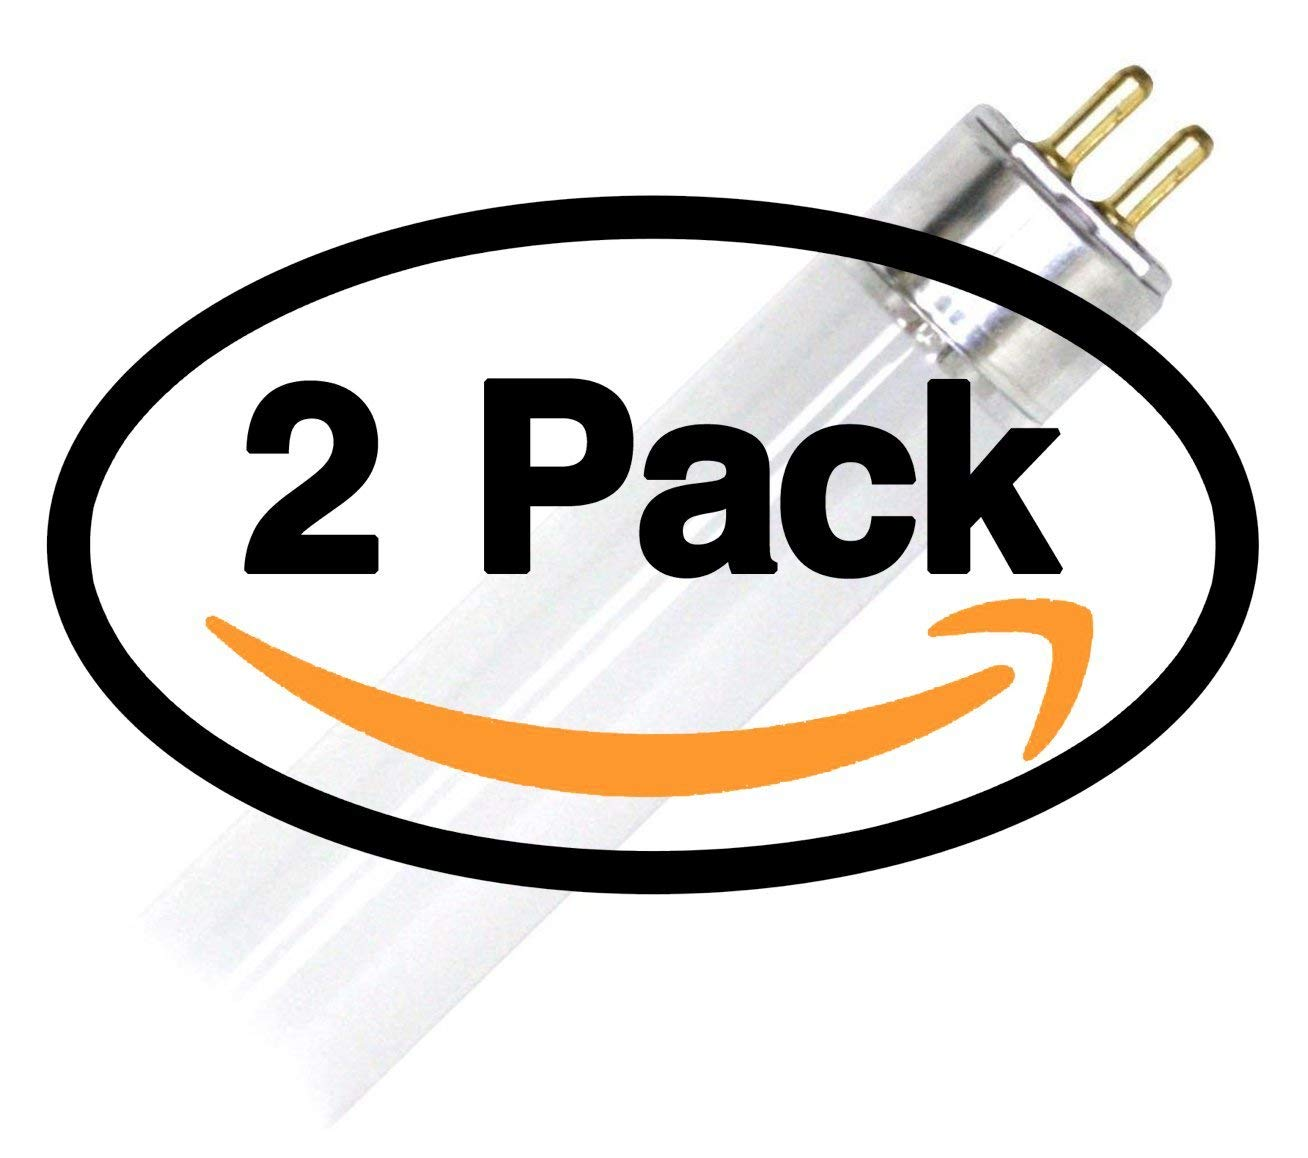 (2 Pack) GE 46673 - F14W/T5/841/ECO 14 Watt T5 Fluorescent Tube Light Bulb